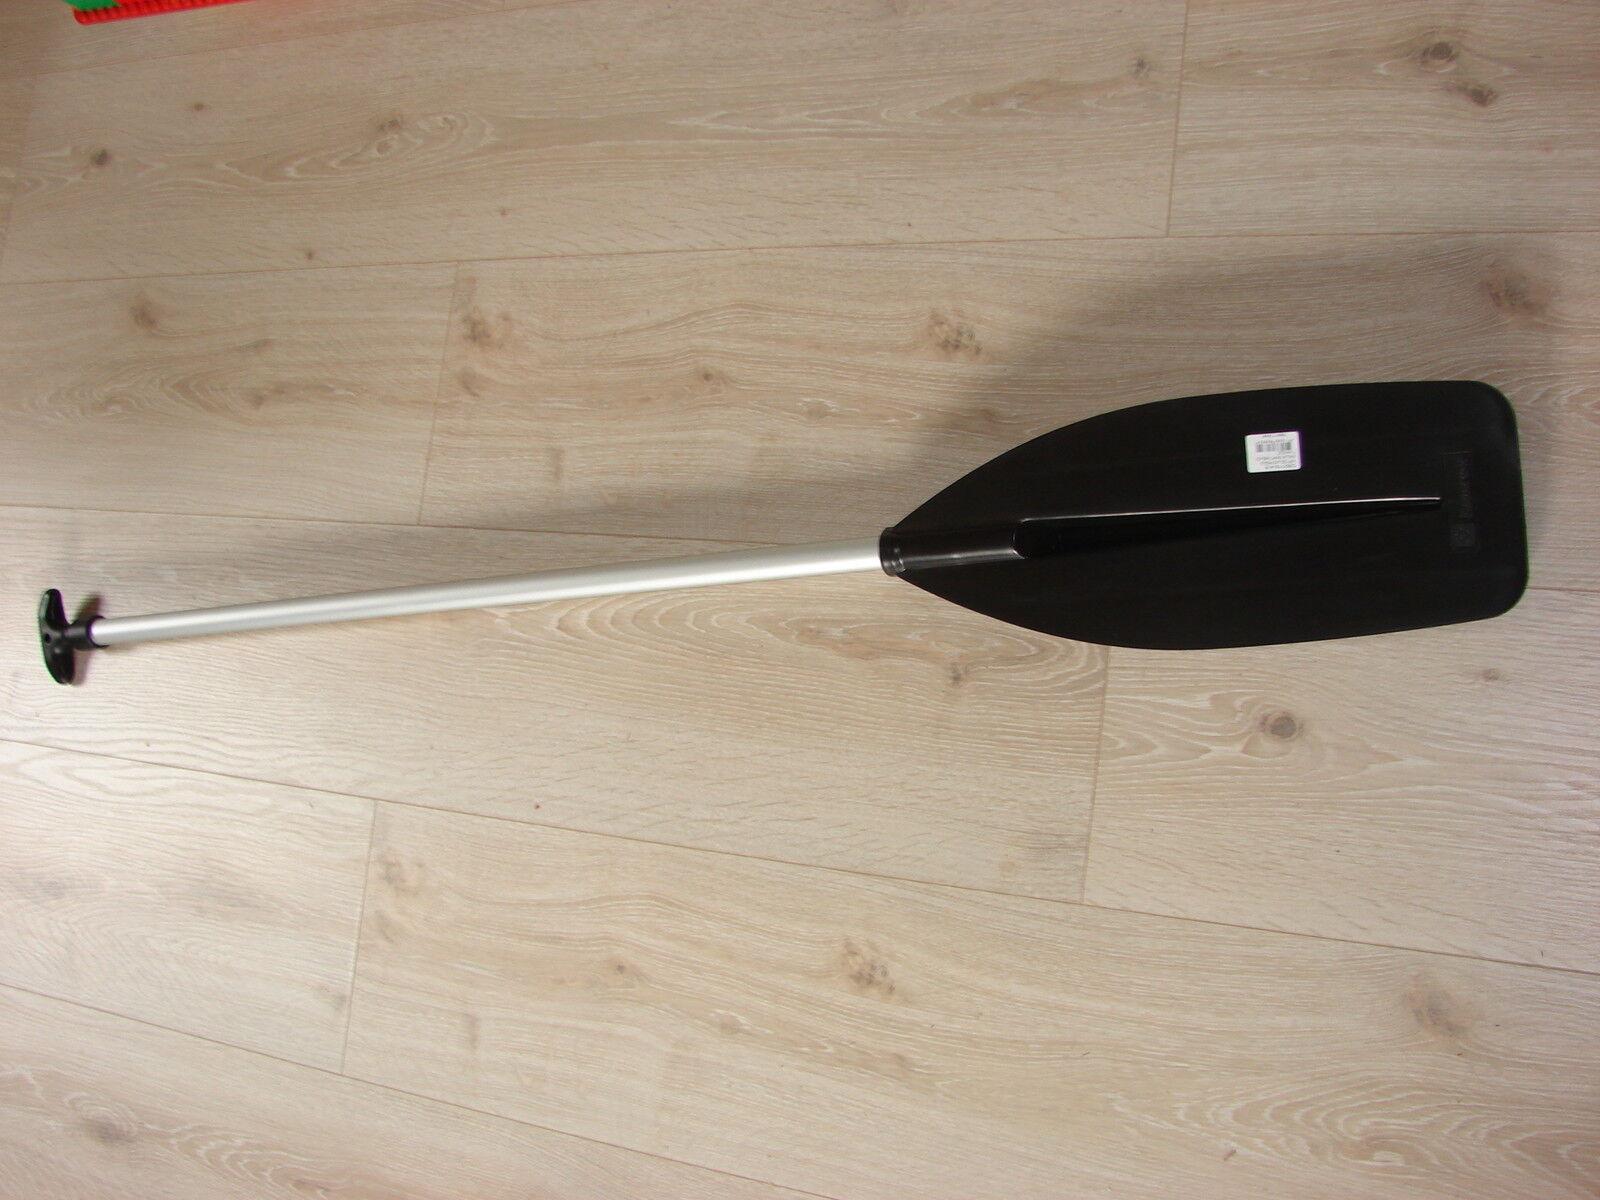 Stechpaddel Paddel Alu-Schaft 137cm Gesamtlänge Gesamtlänge 137cm neu f06fa3